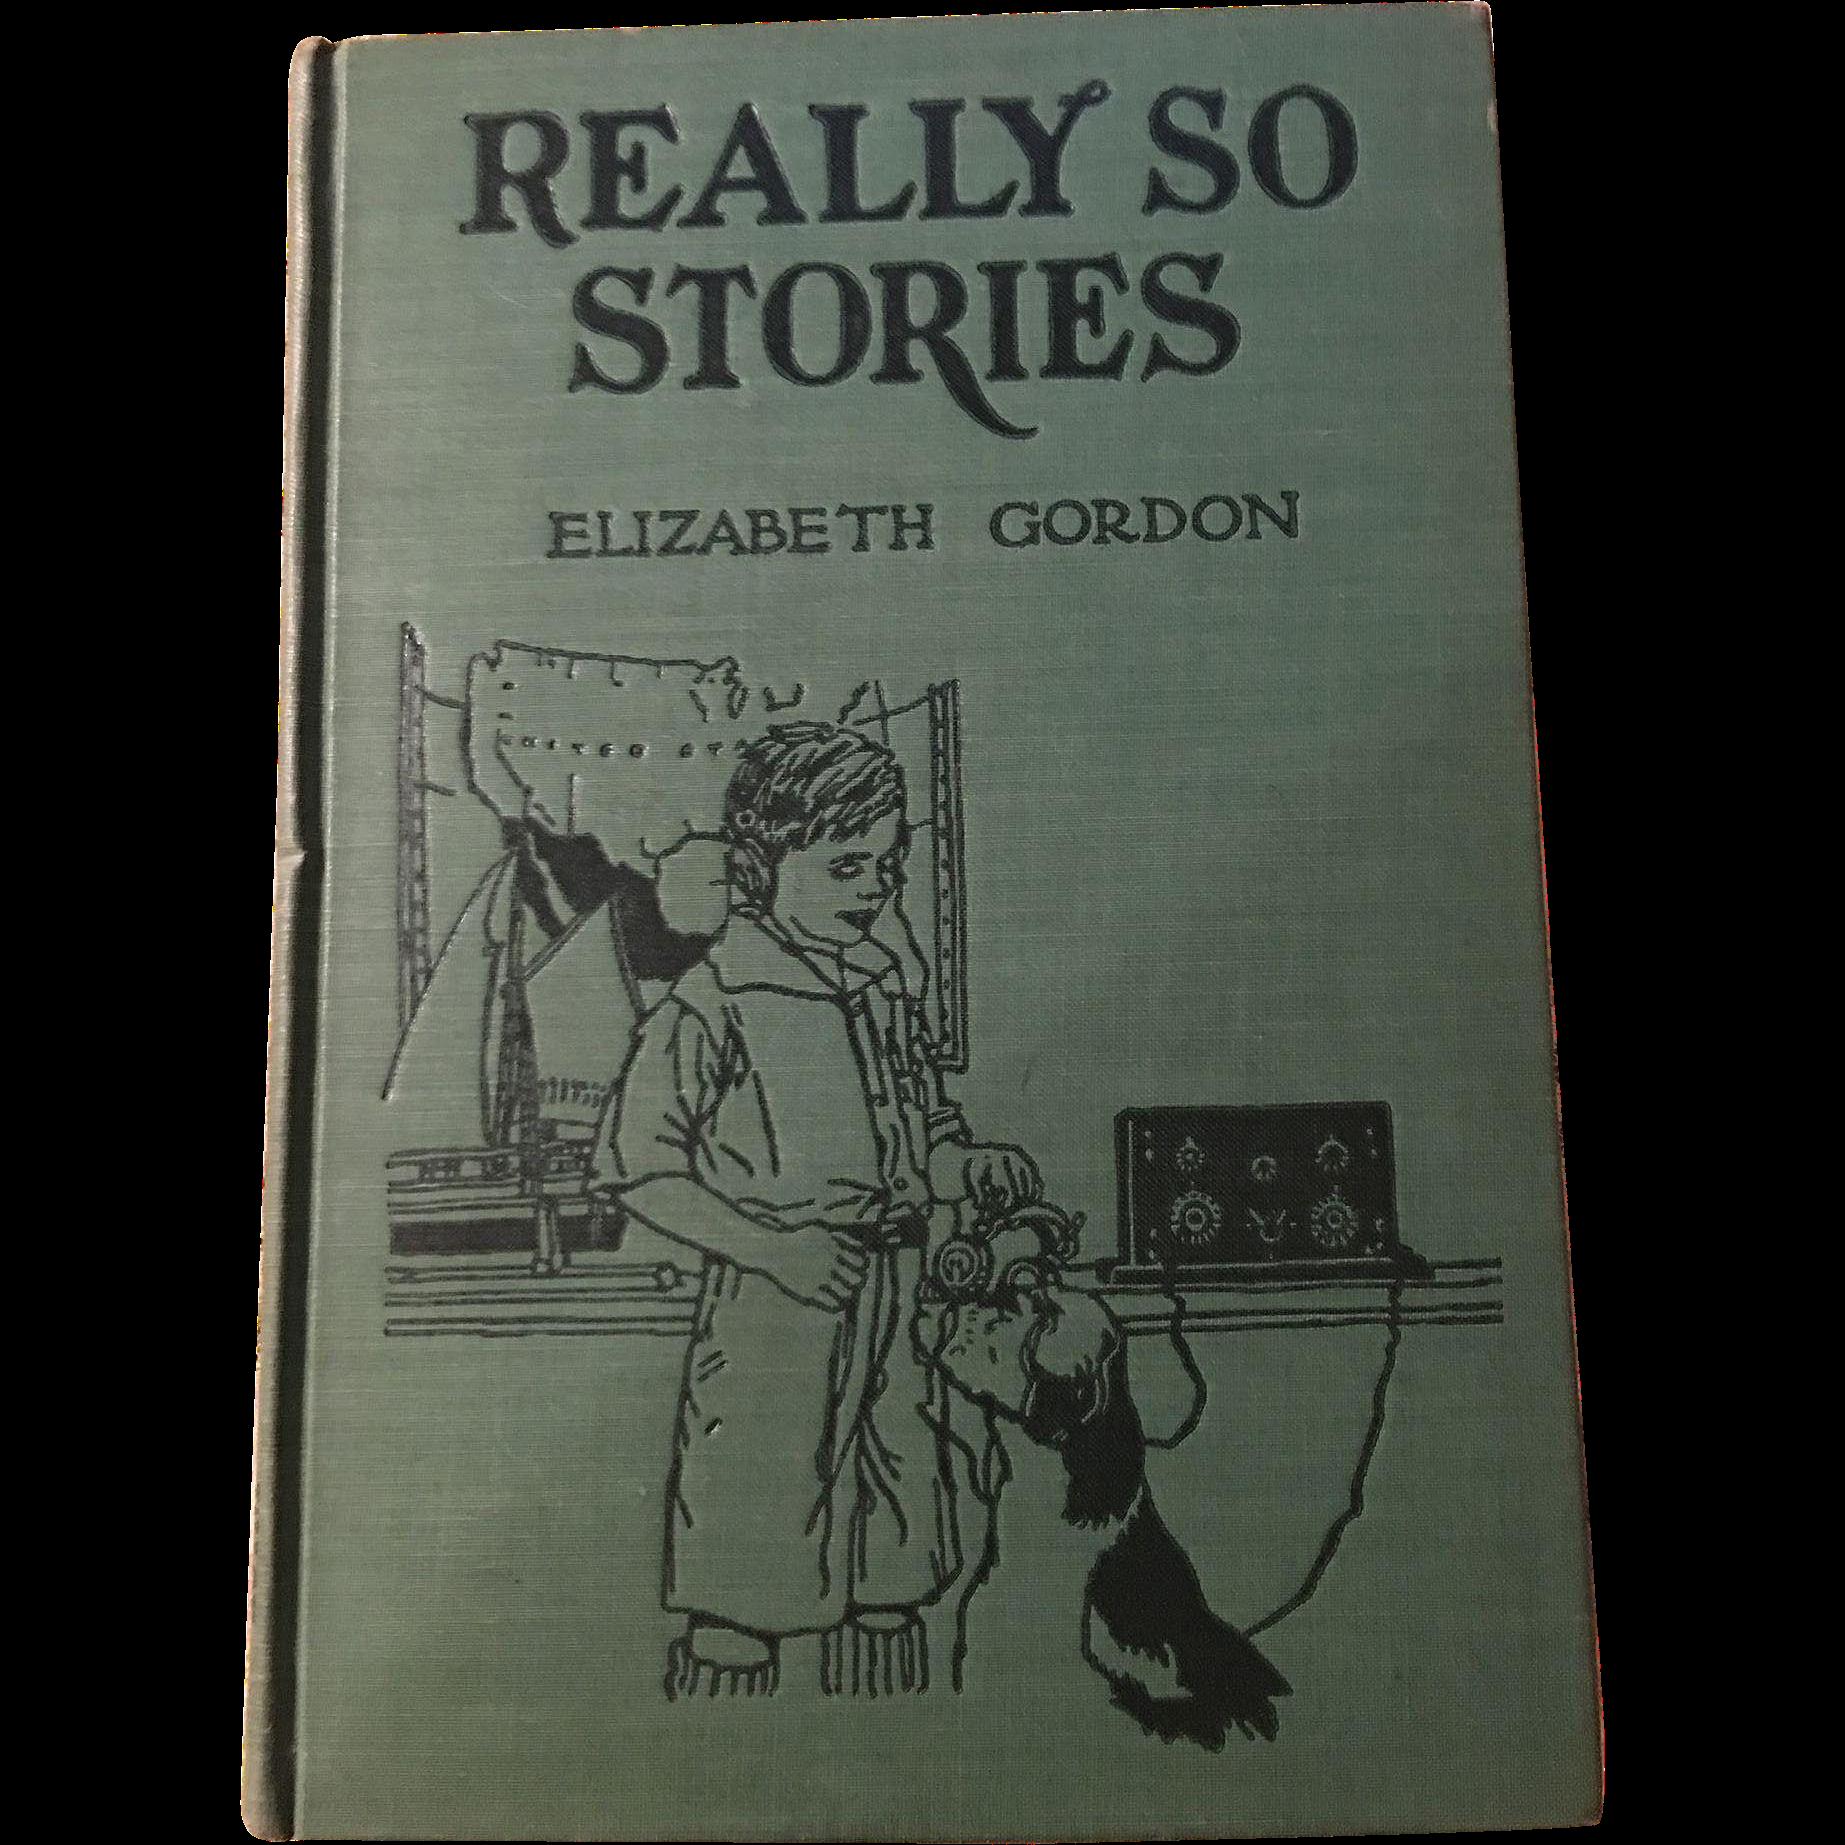 1937 Really So Stories Elizabeth Gordon Illustrated by John Rae